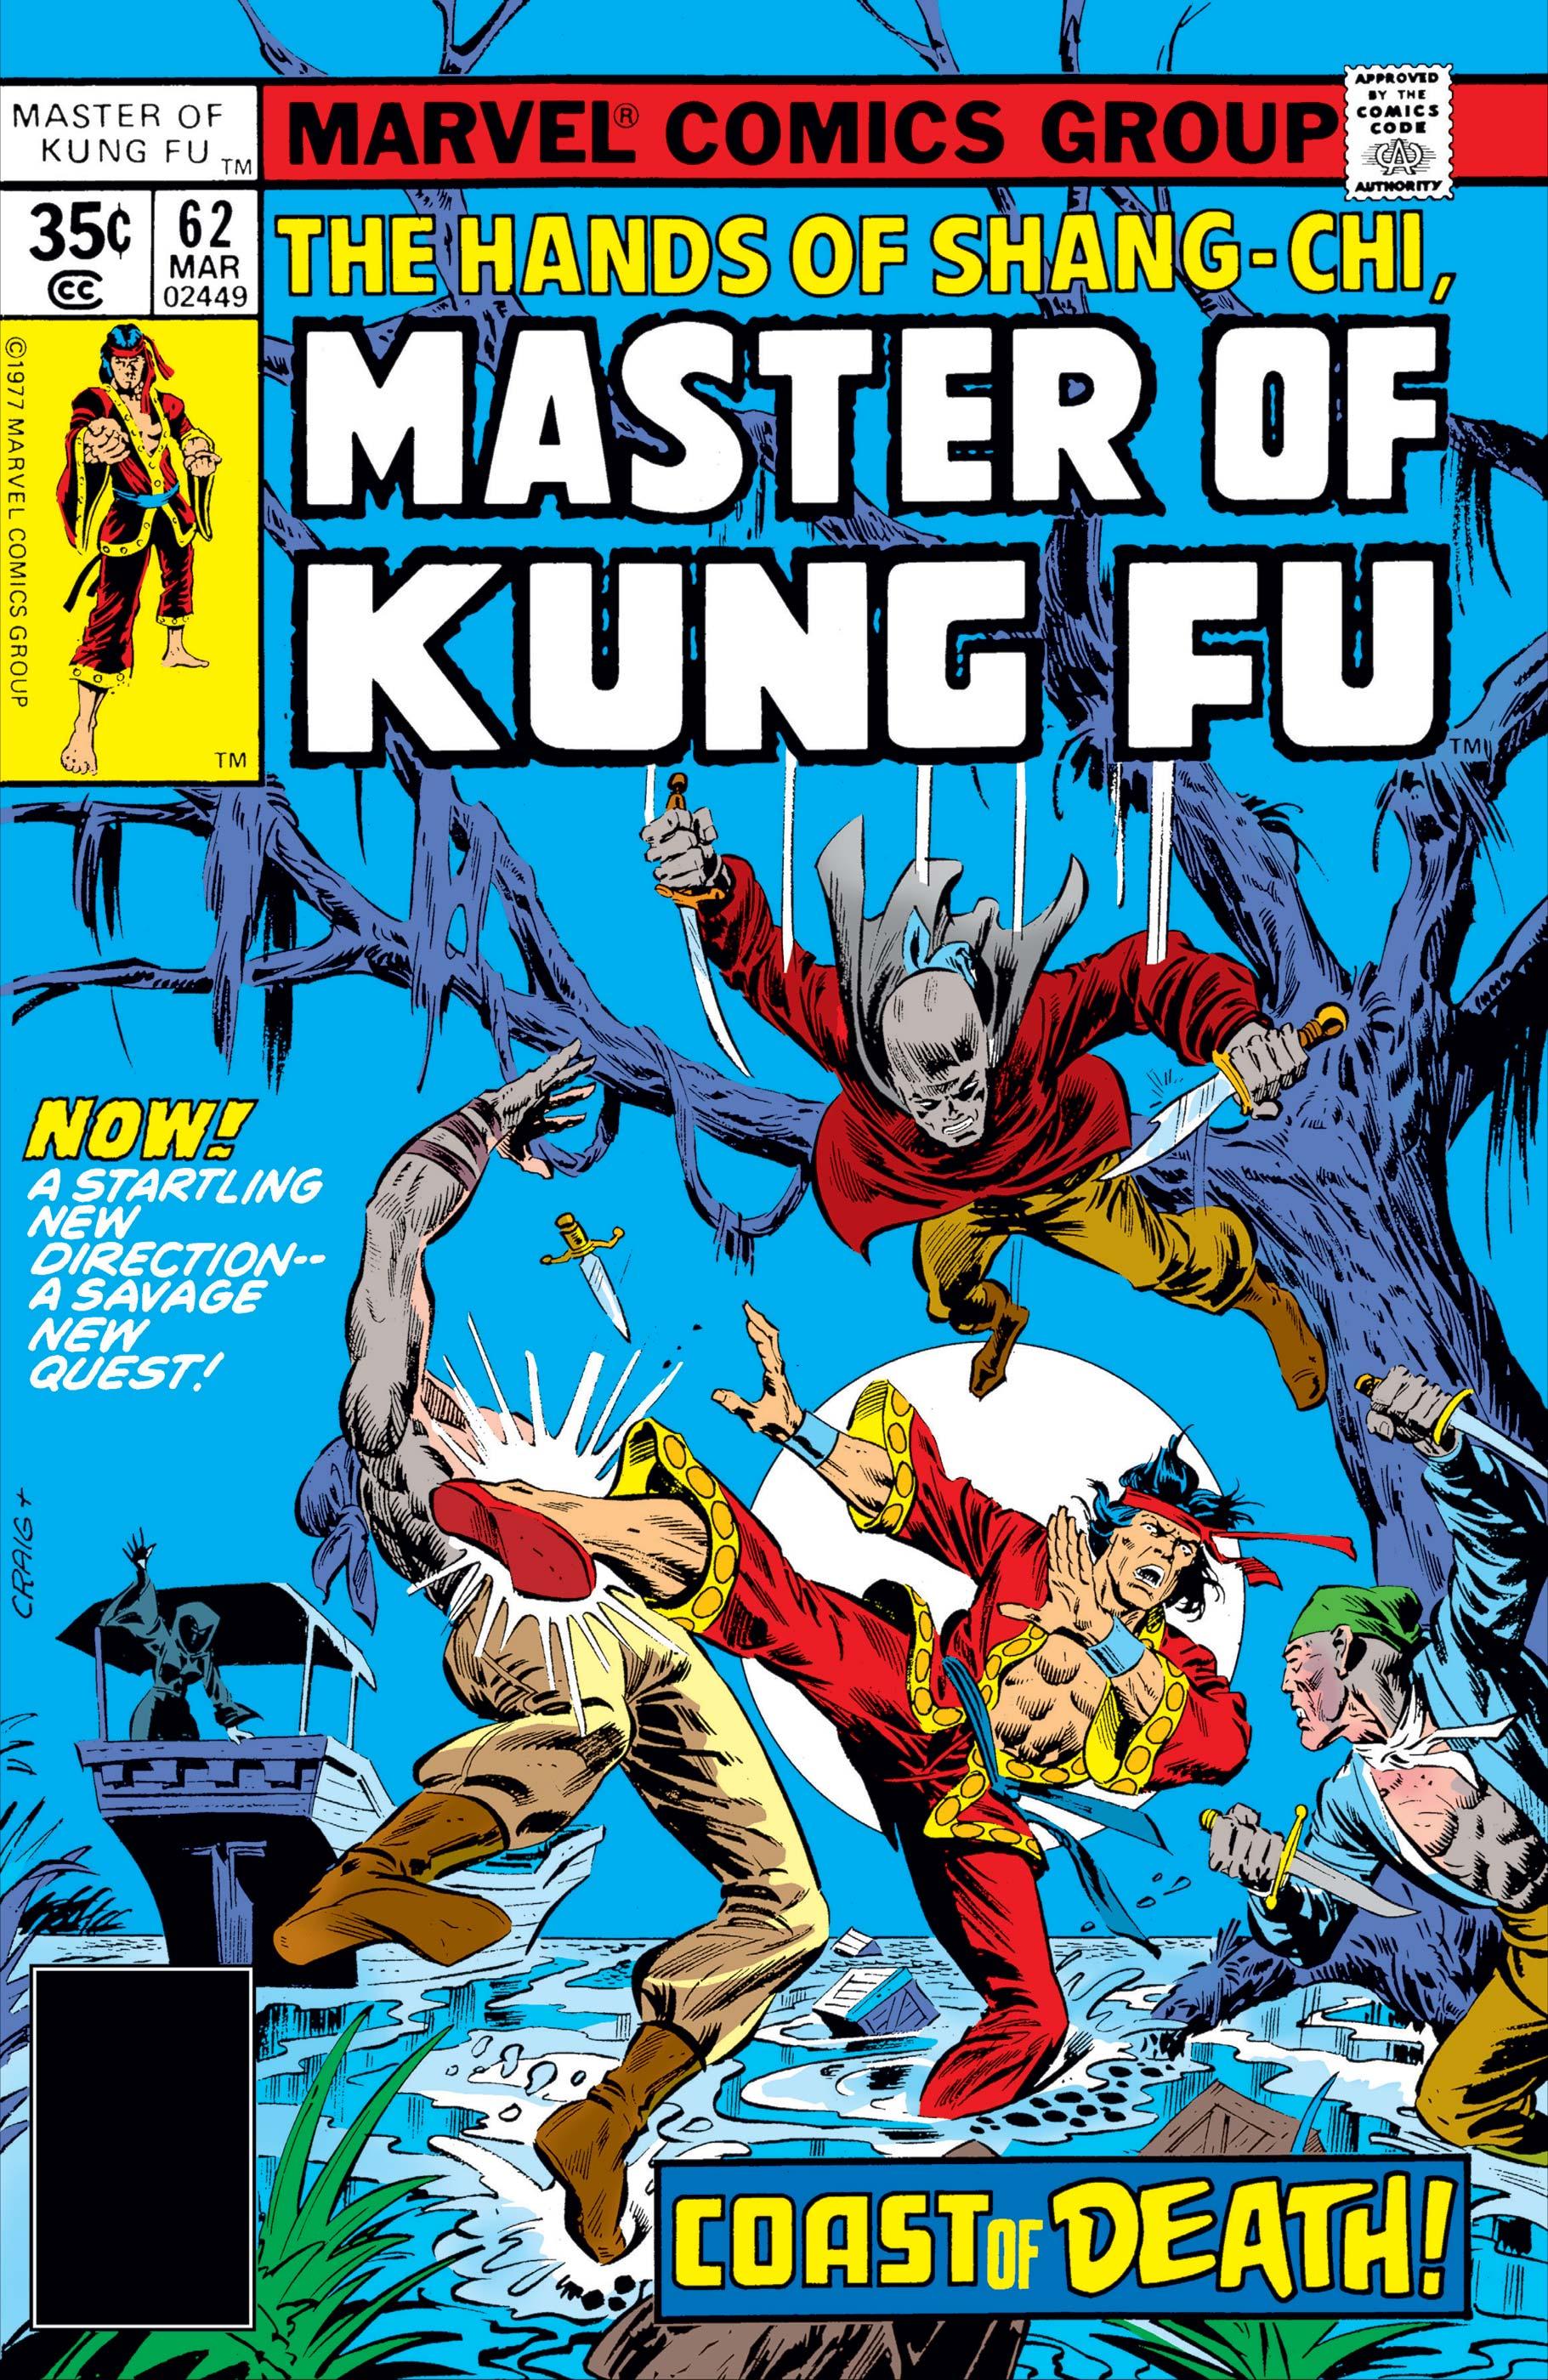 Master of Kung Fu (1974) #62